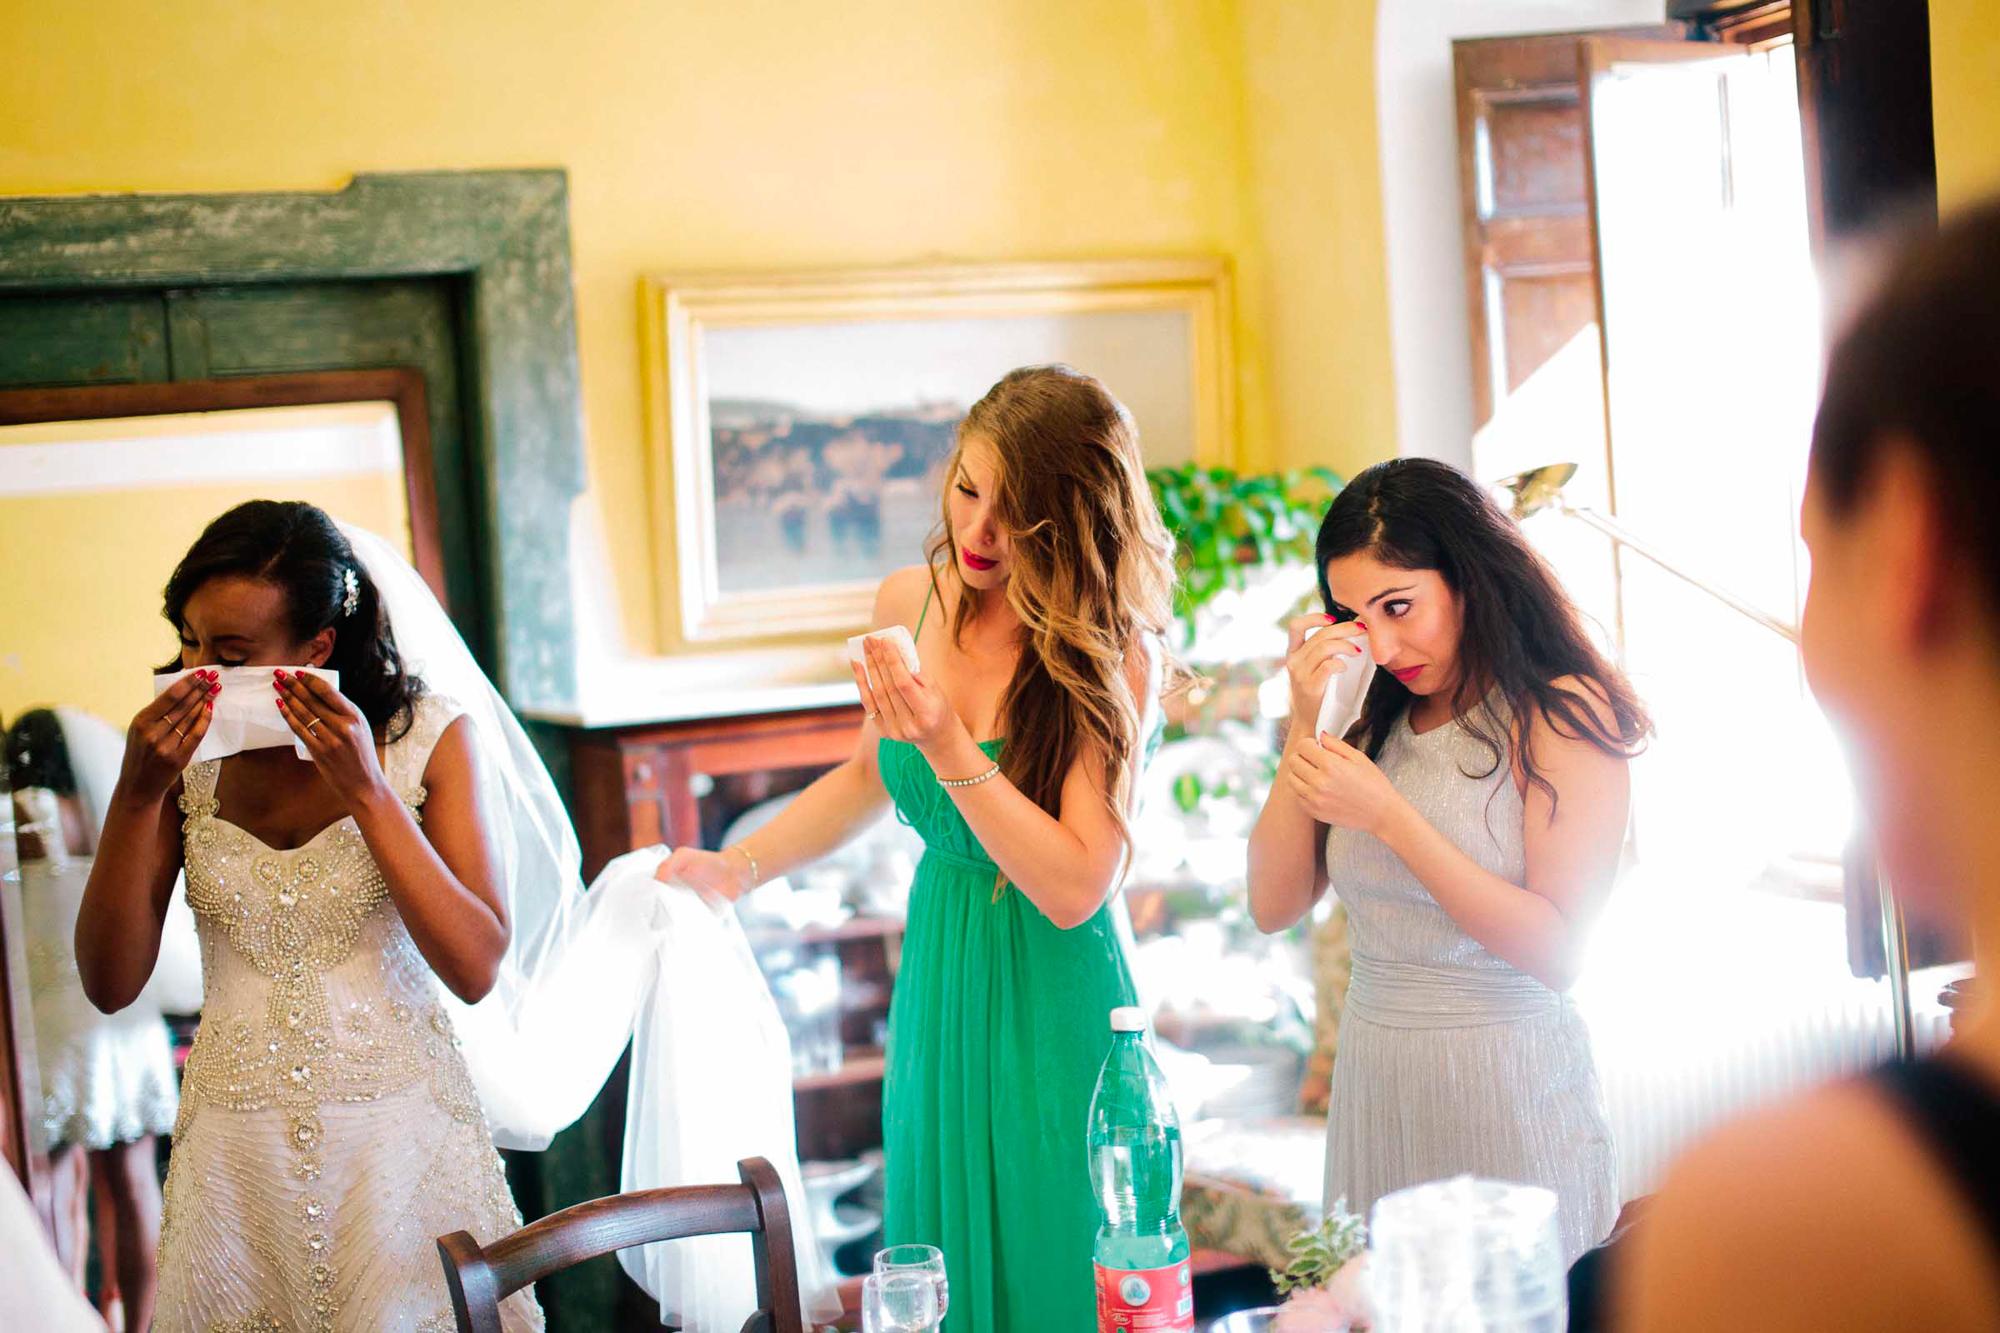 047-sorrento-wedding-photographer.jpg